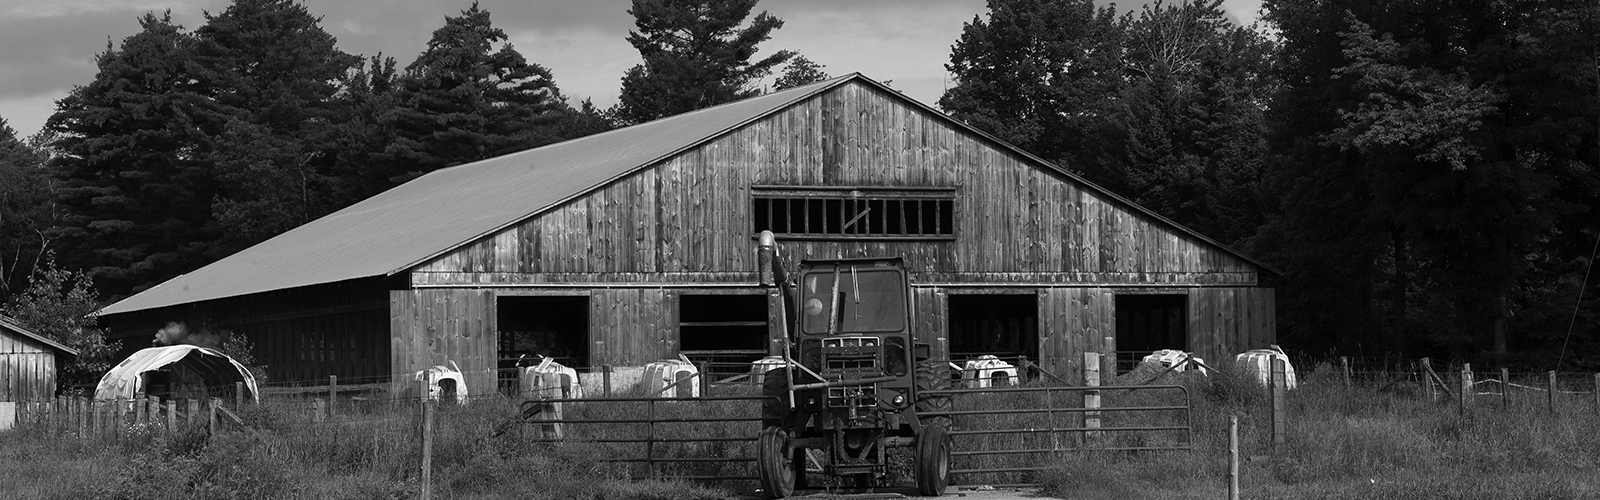 Hook Dairy Farm